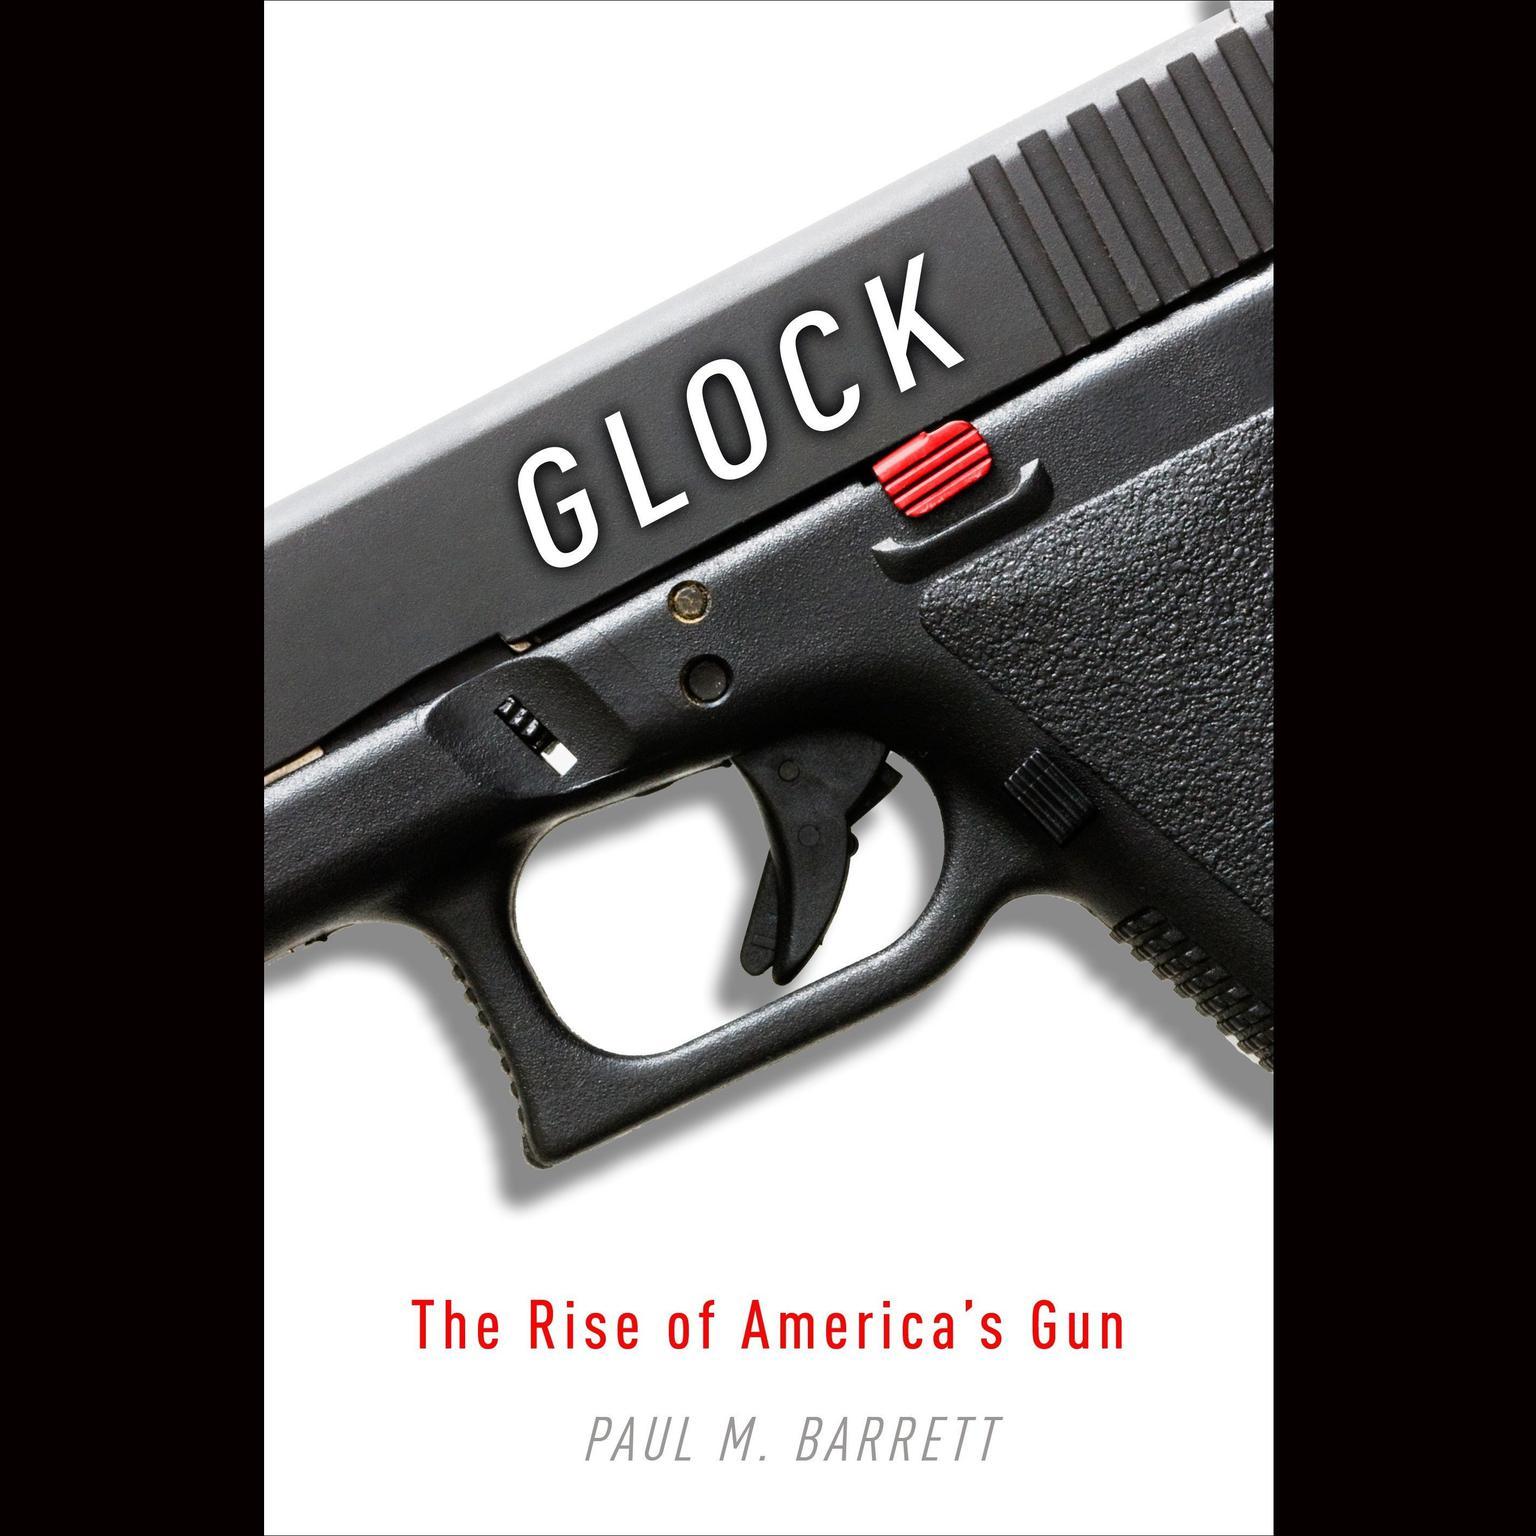 Glock: The Rise of Americas Gun Audiobook, by Paul M. Barrett